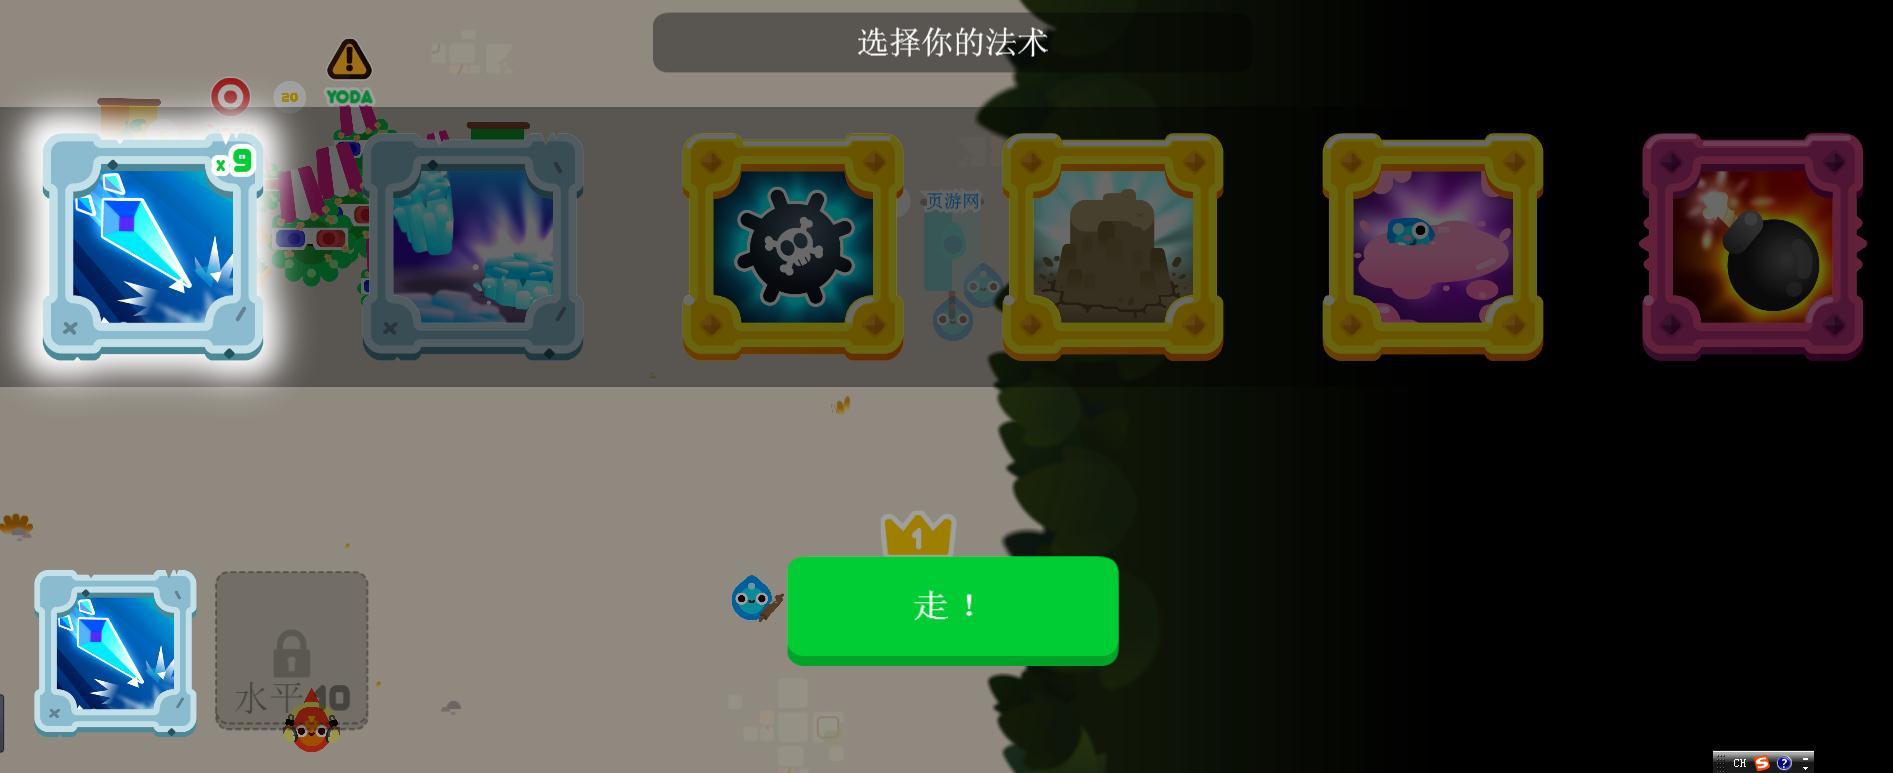 《Tribs.io》游戏截图